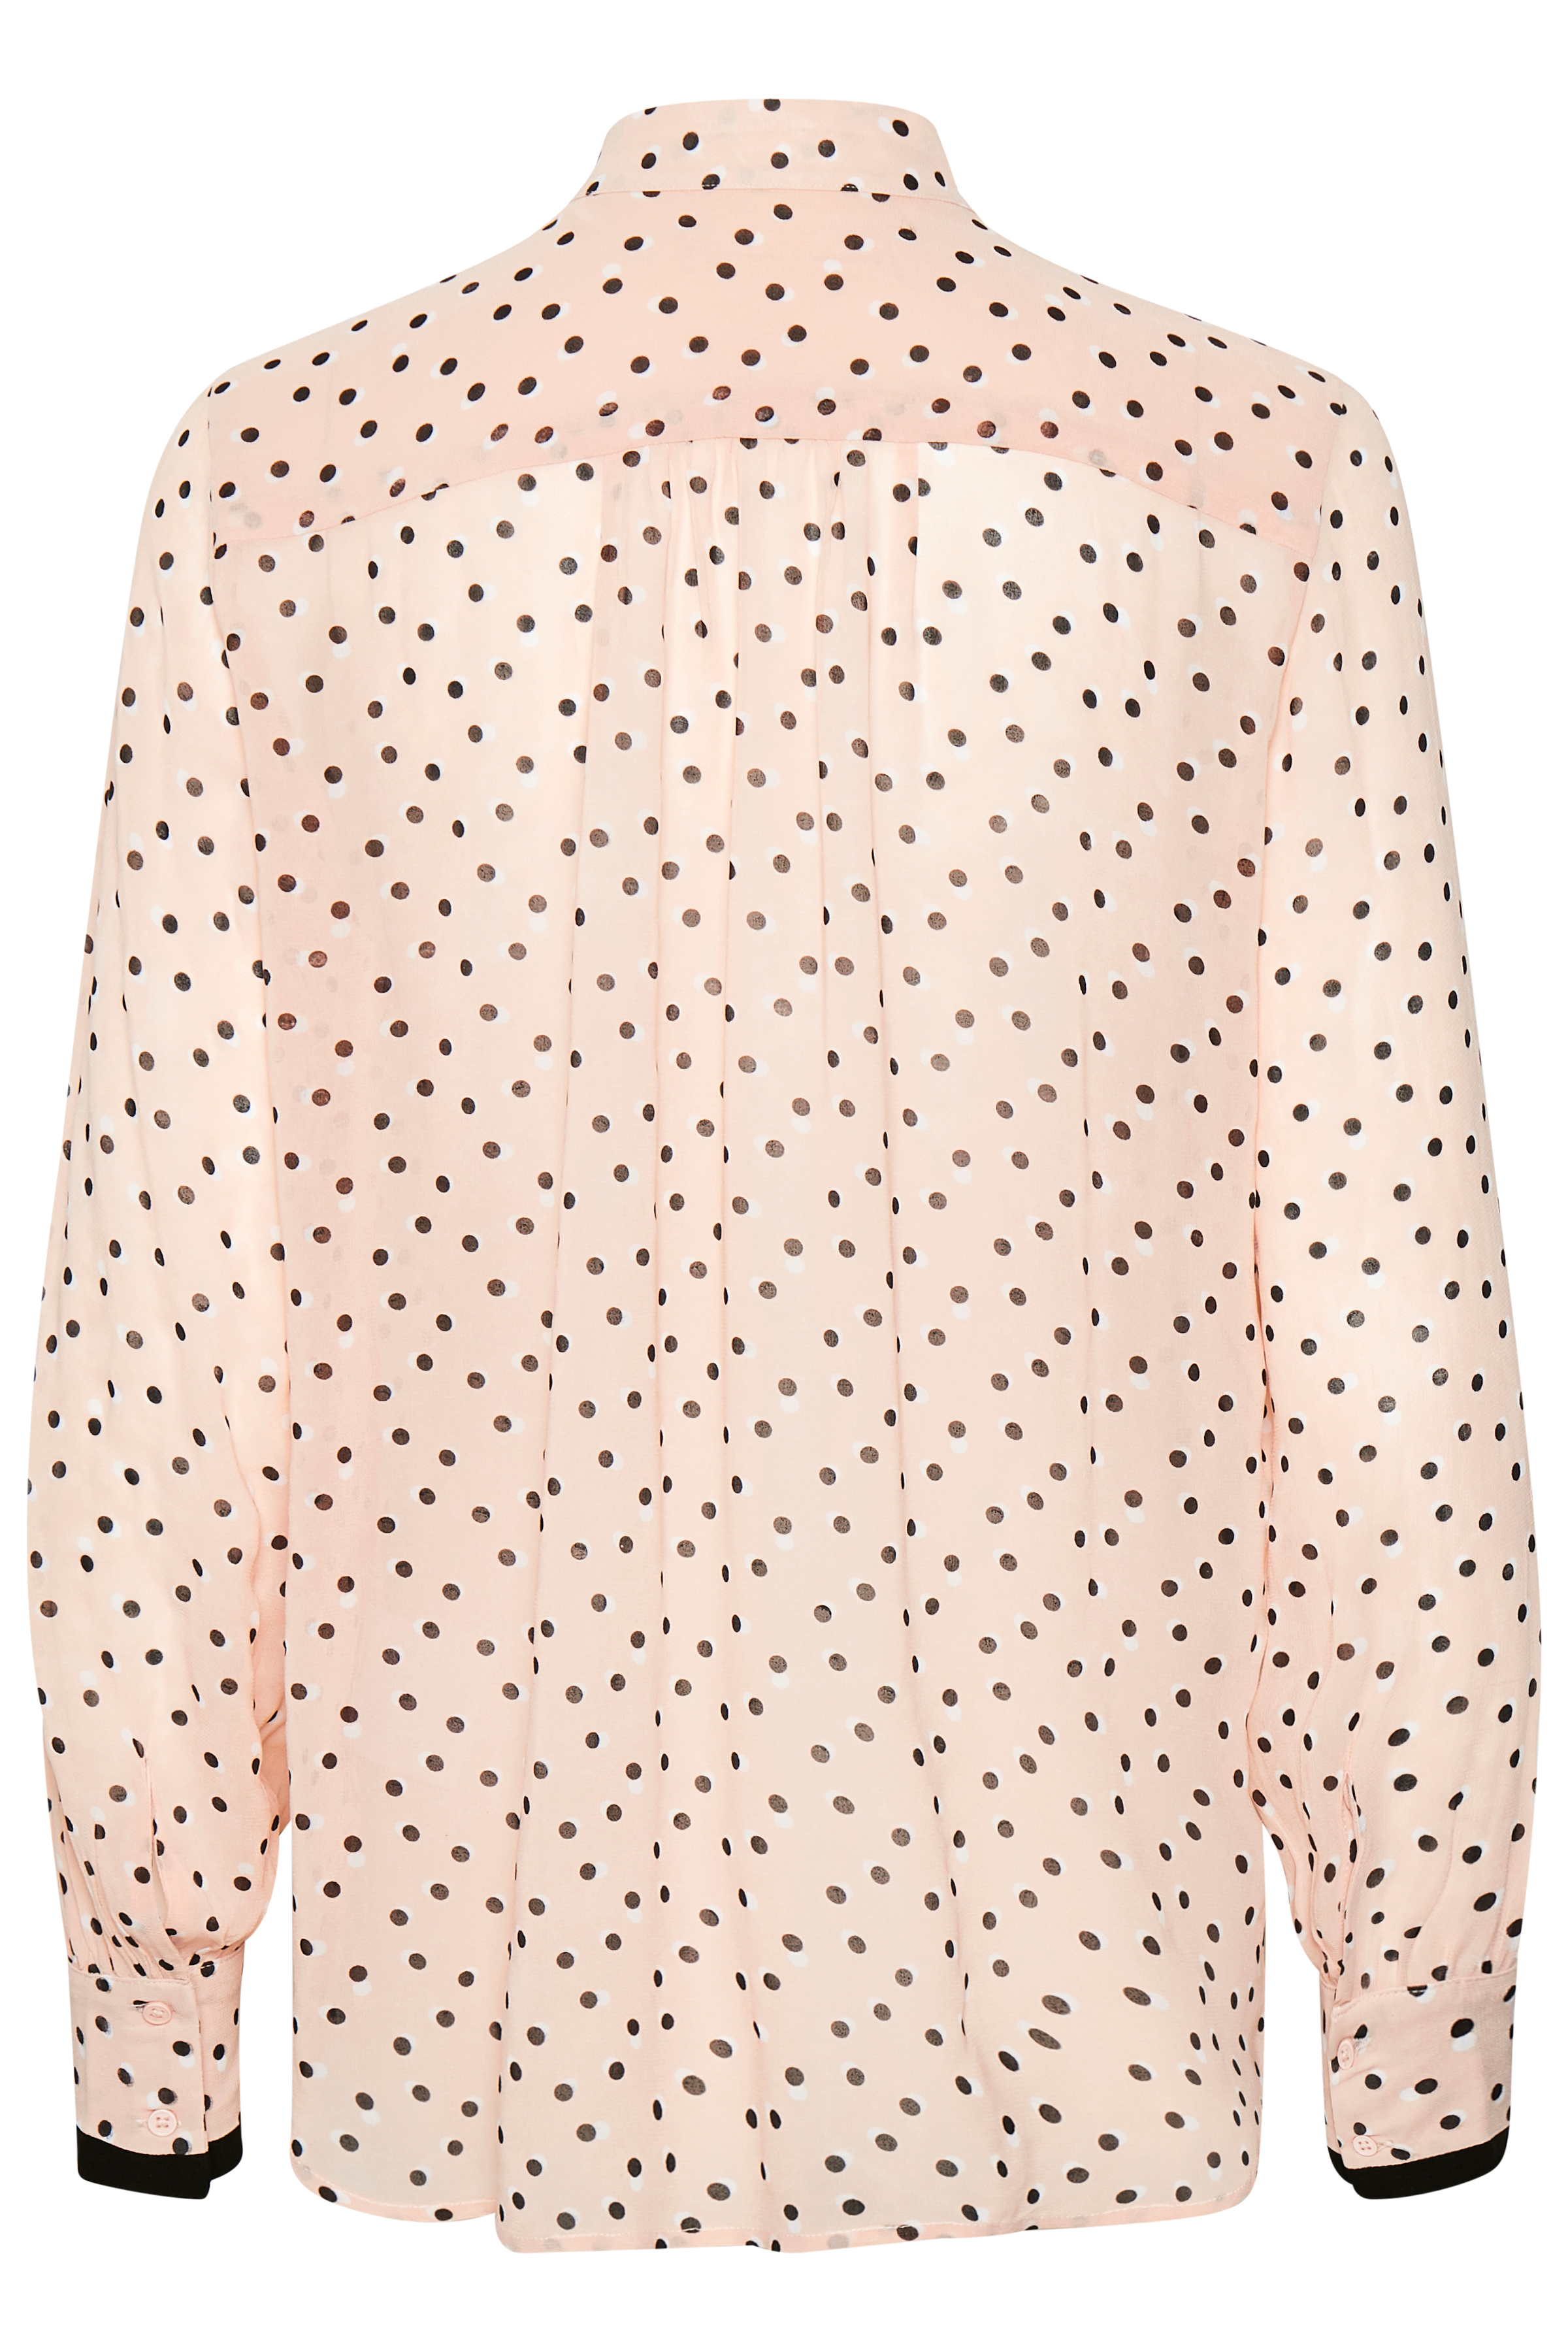 Rose Dust Double Dot Langærmet skjorte – Køb Rose Dust Double Dot Langærmet skjorte fra str. 32-42 her